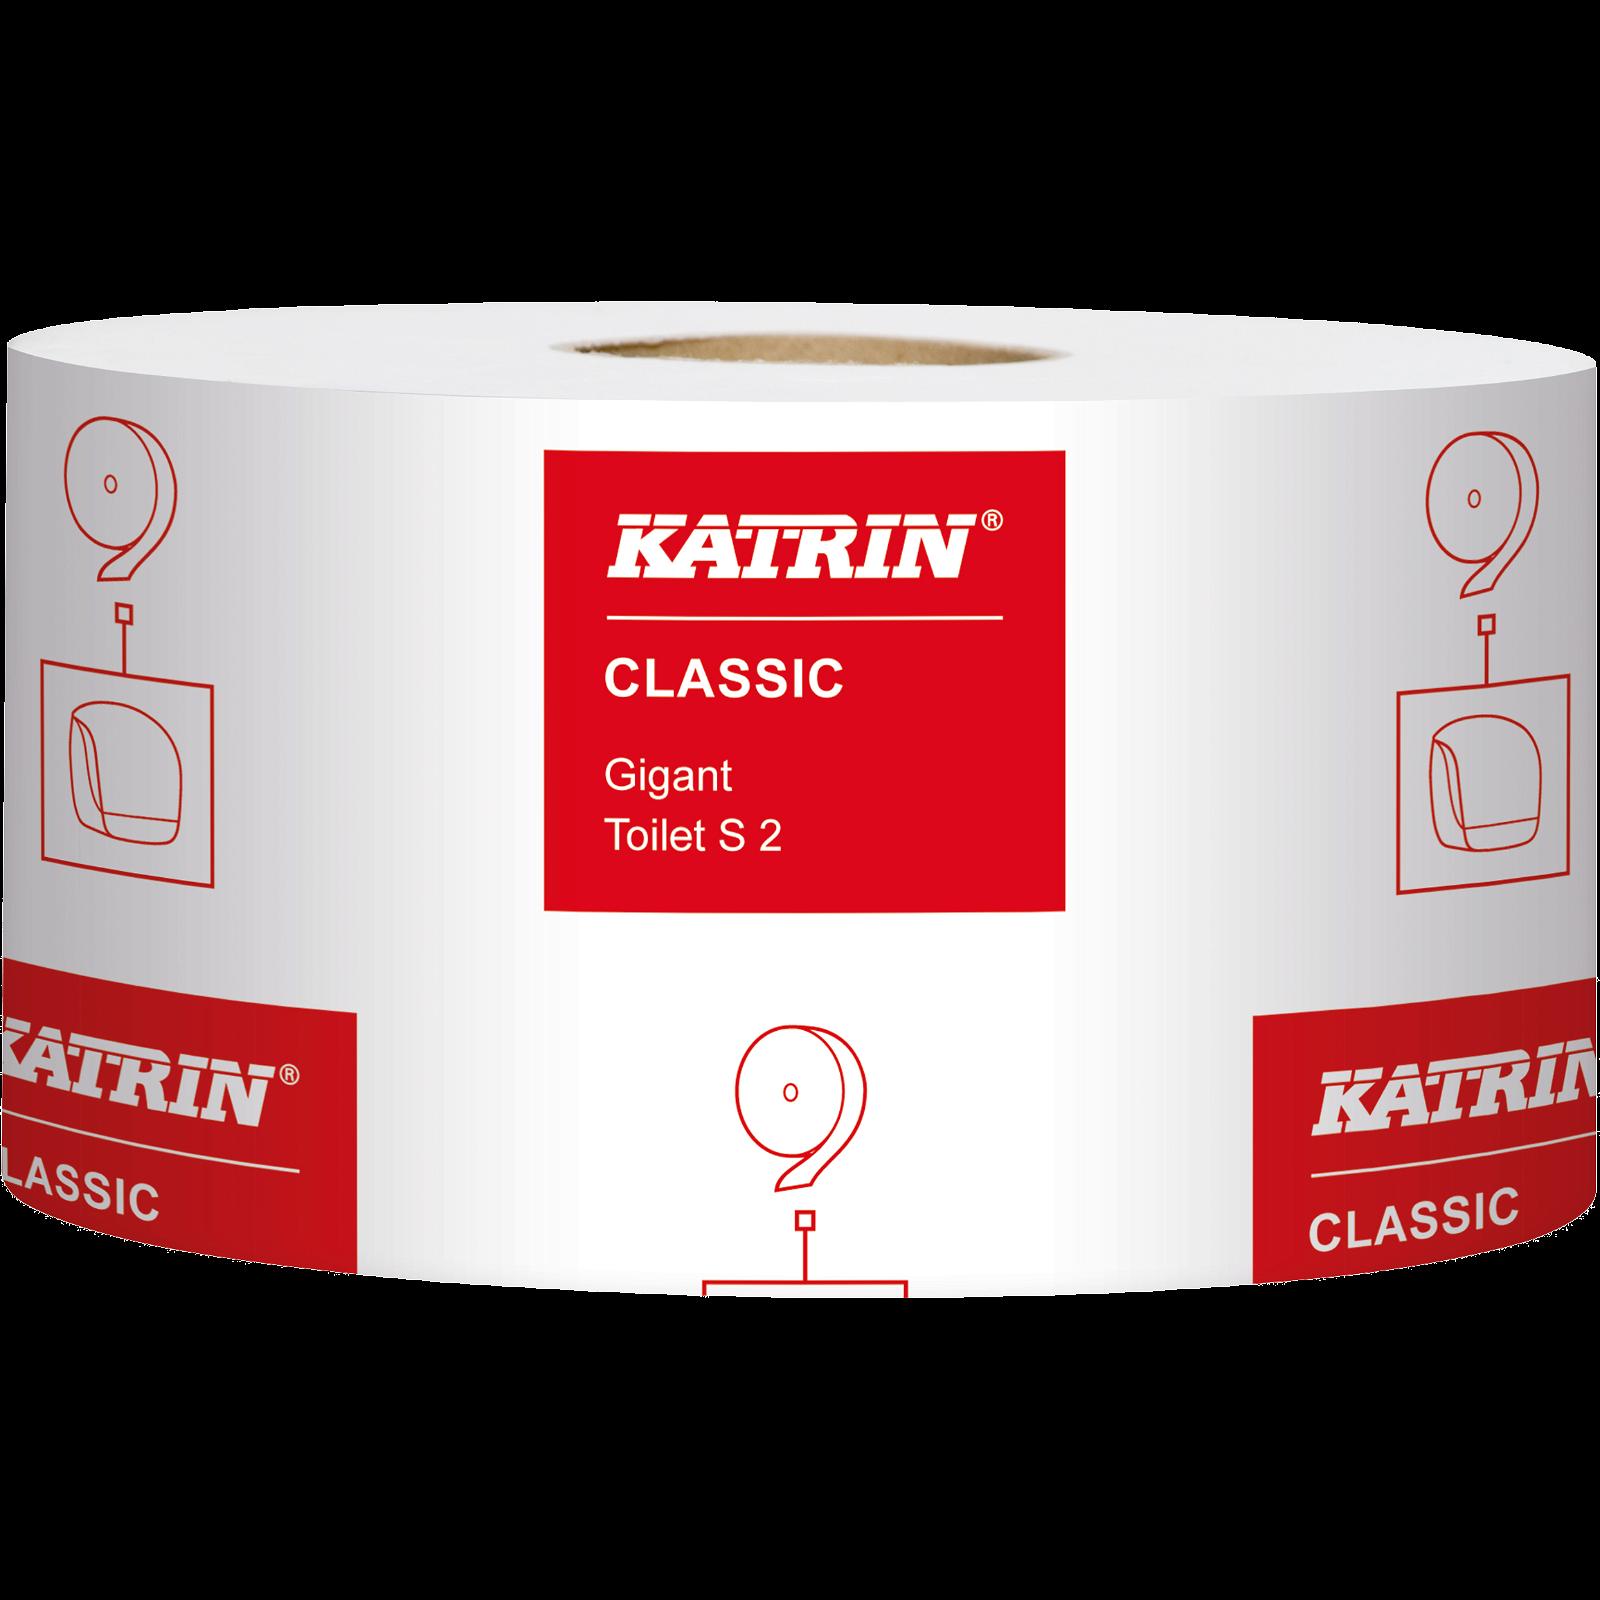 Katrin Classic Gigant toiletpapir